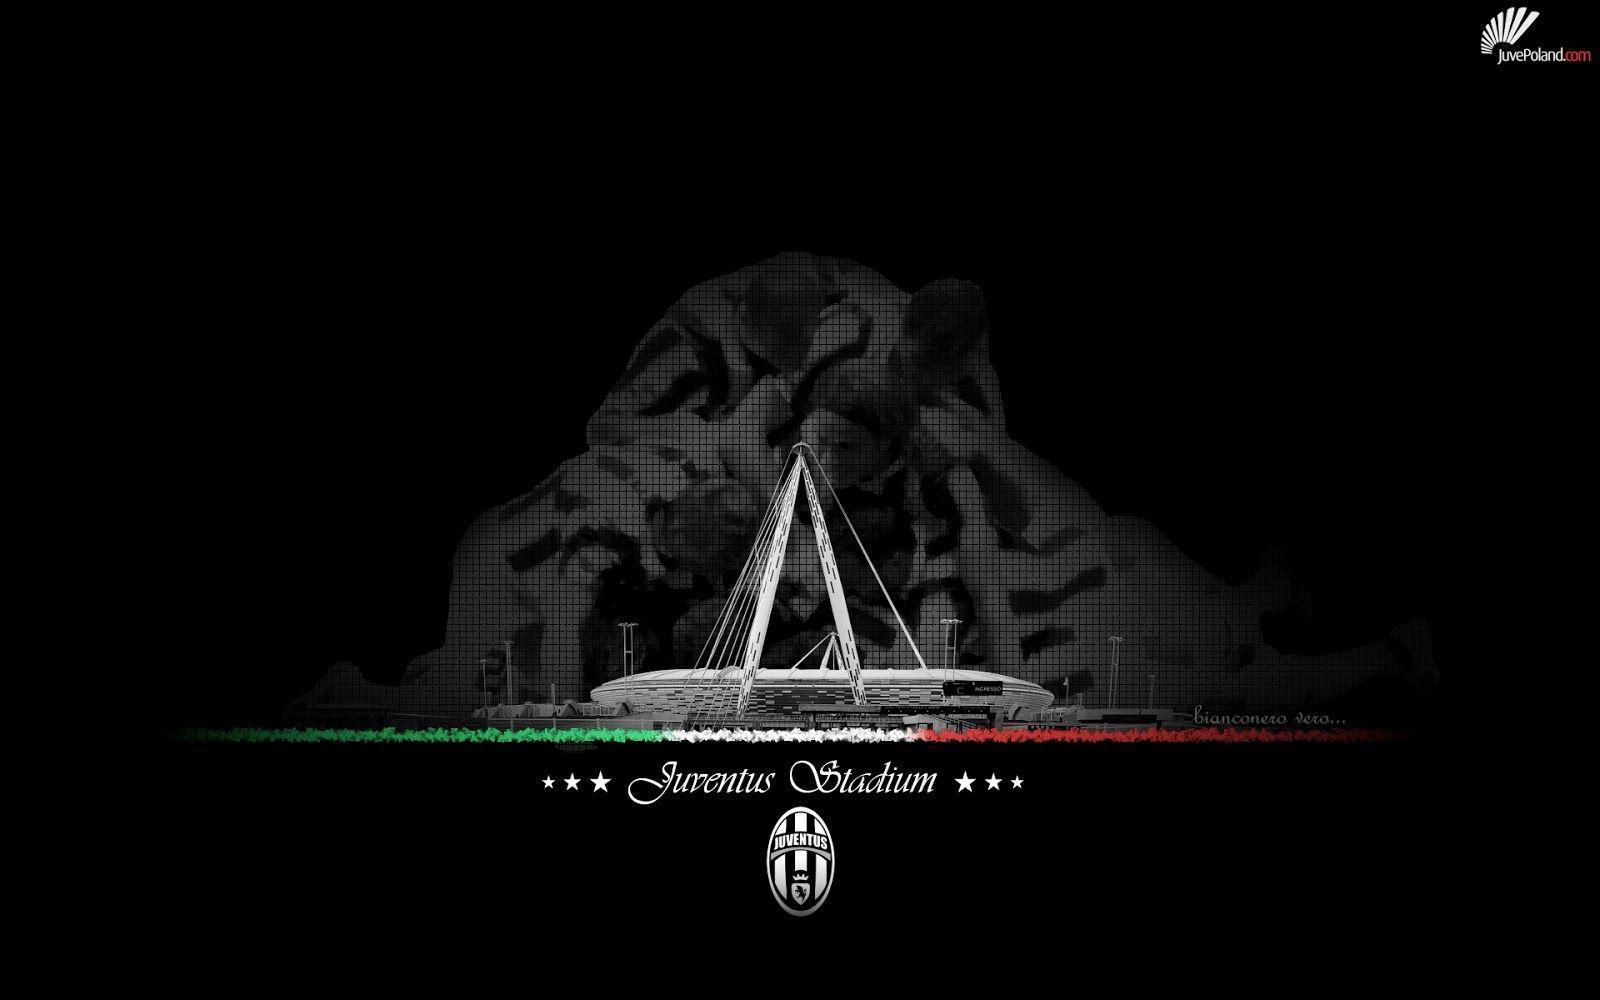 Juventus stadium wallpapers wallpaper cave for Immagini juventus